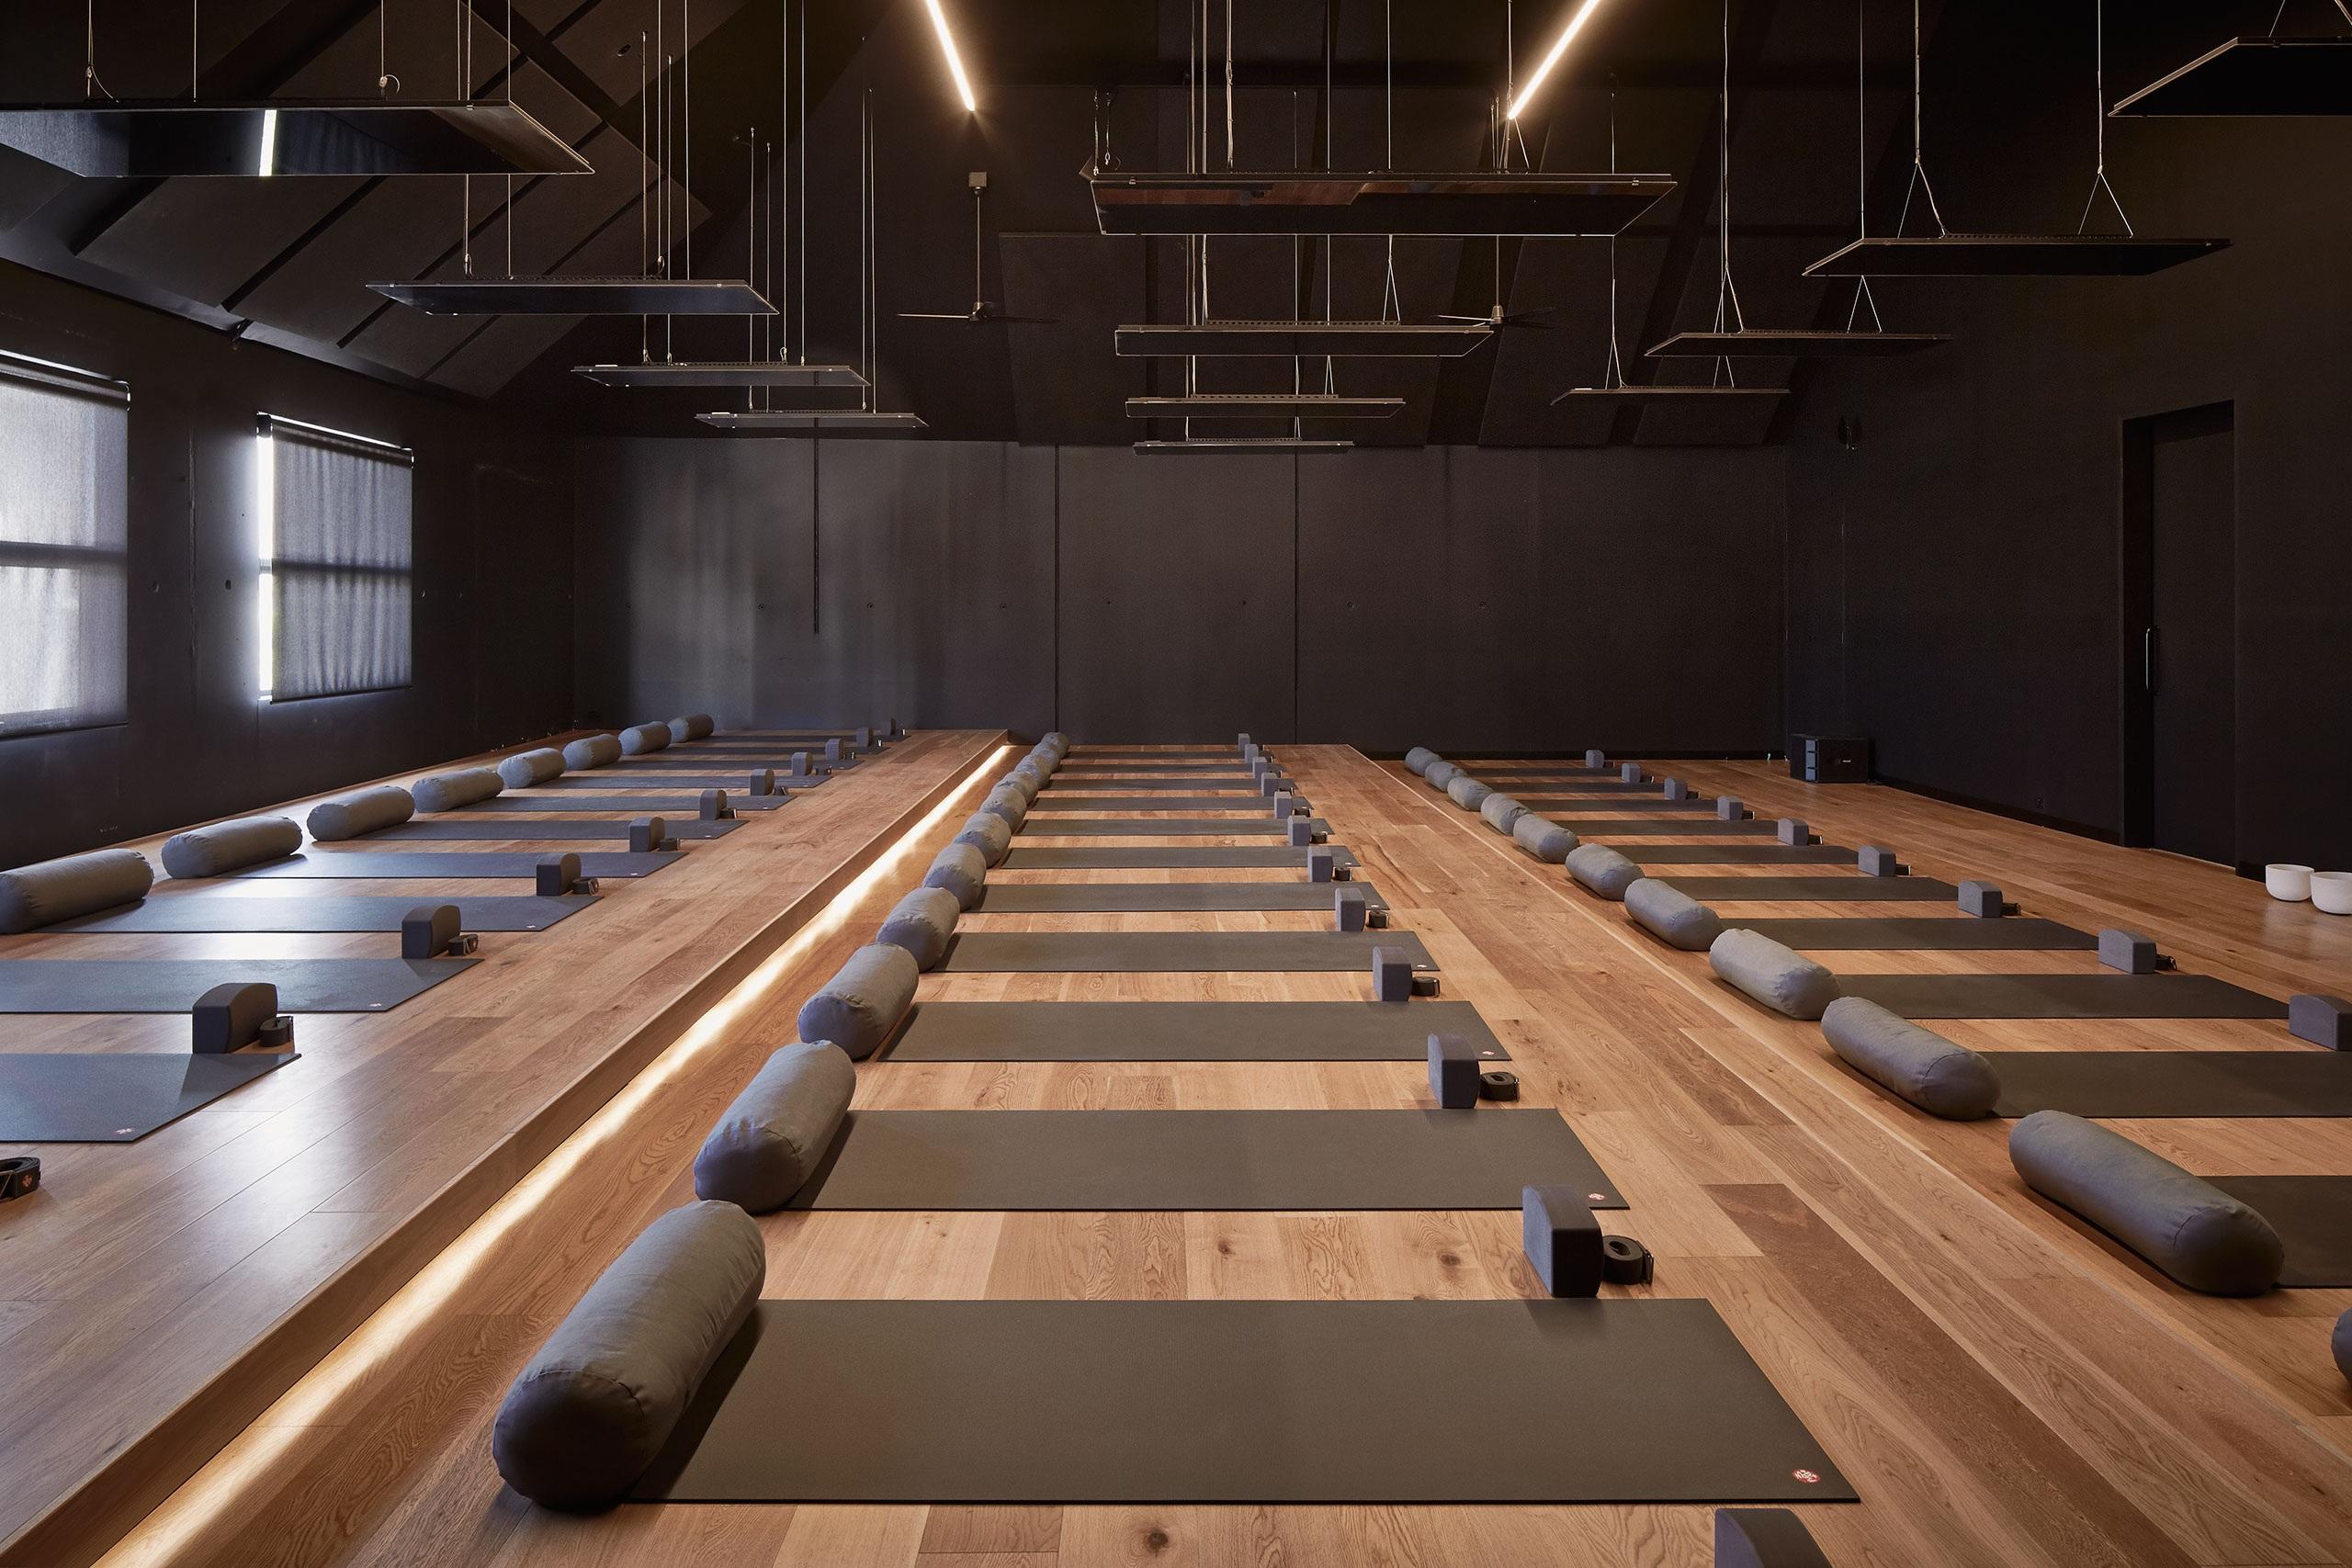 Free Images Structure Wood Auditorium Floor Room Gym Melbourne Screenshot Sport Venue